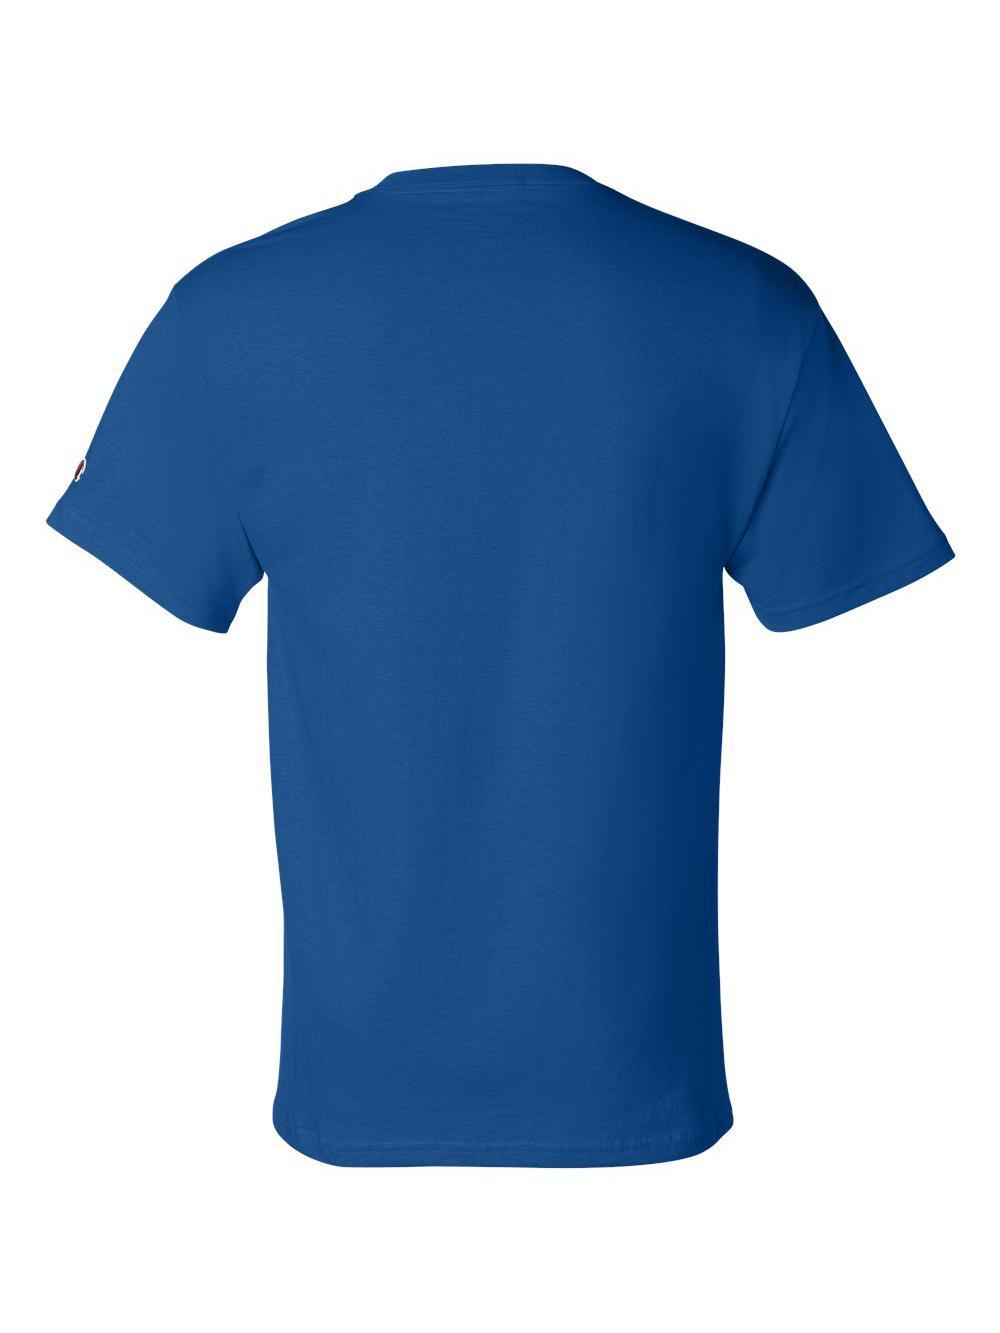 Champion-Short-Sleeve-T-Shirt-T425 thumbnail 28